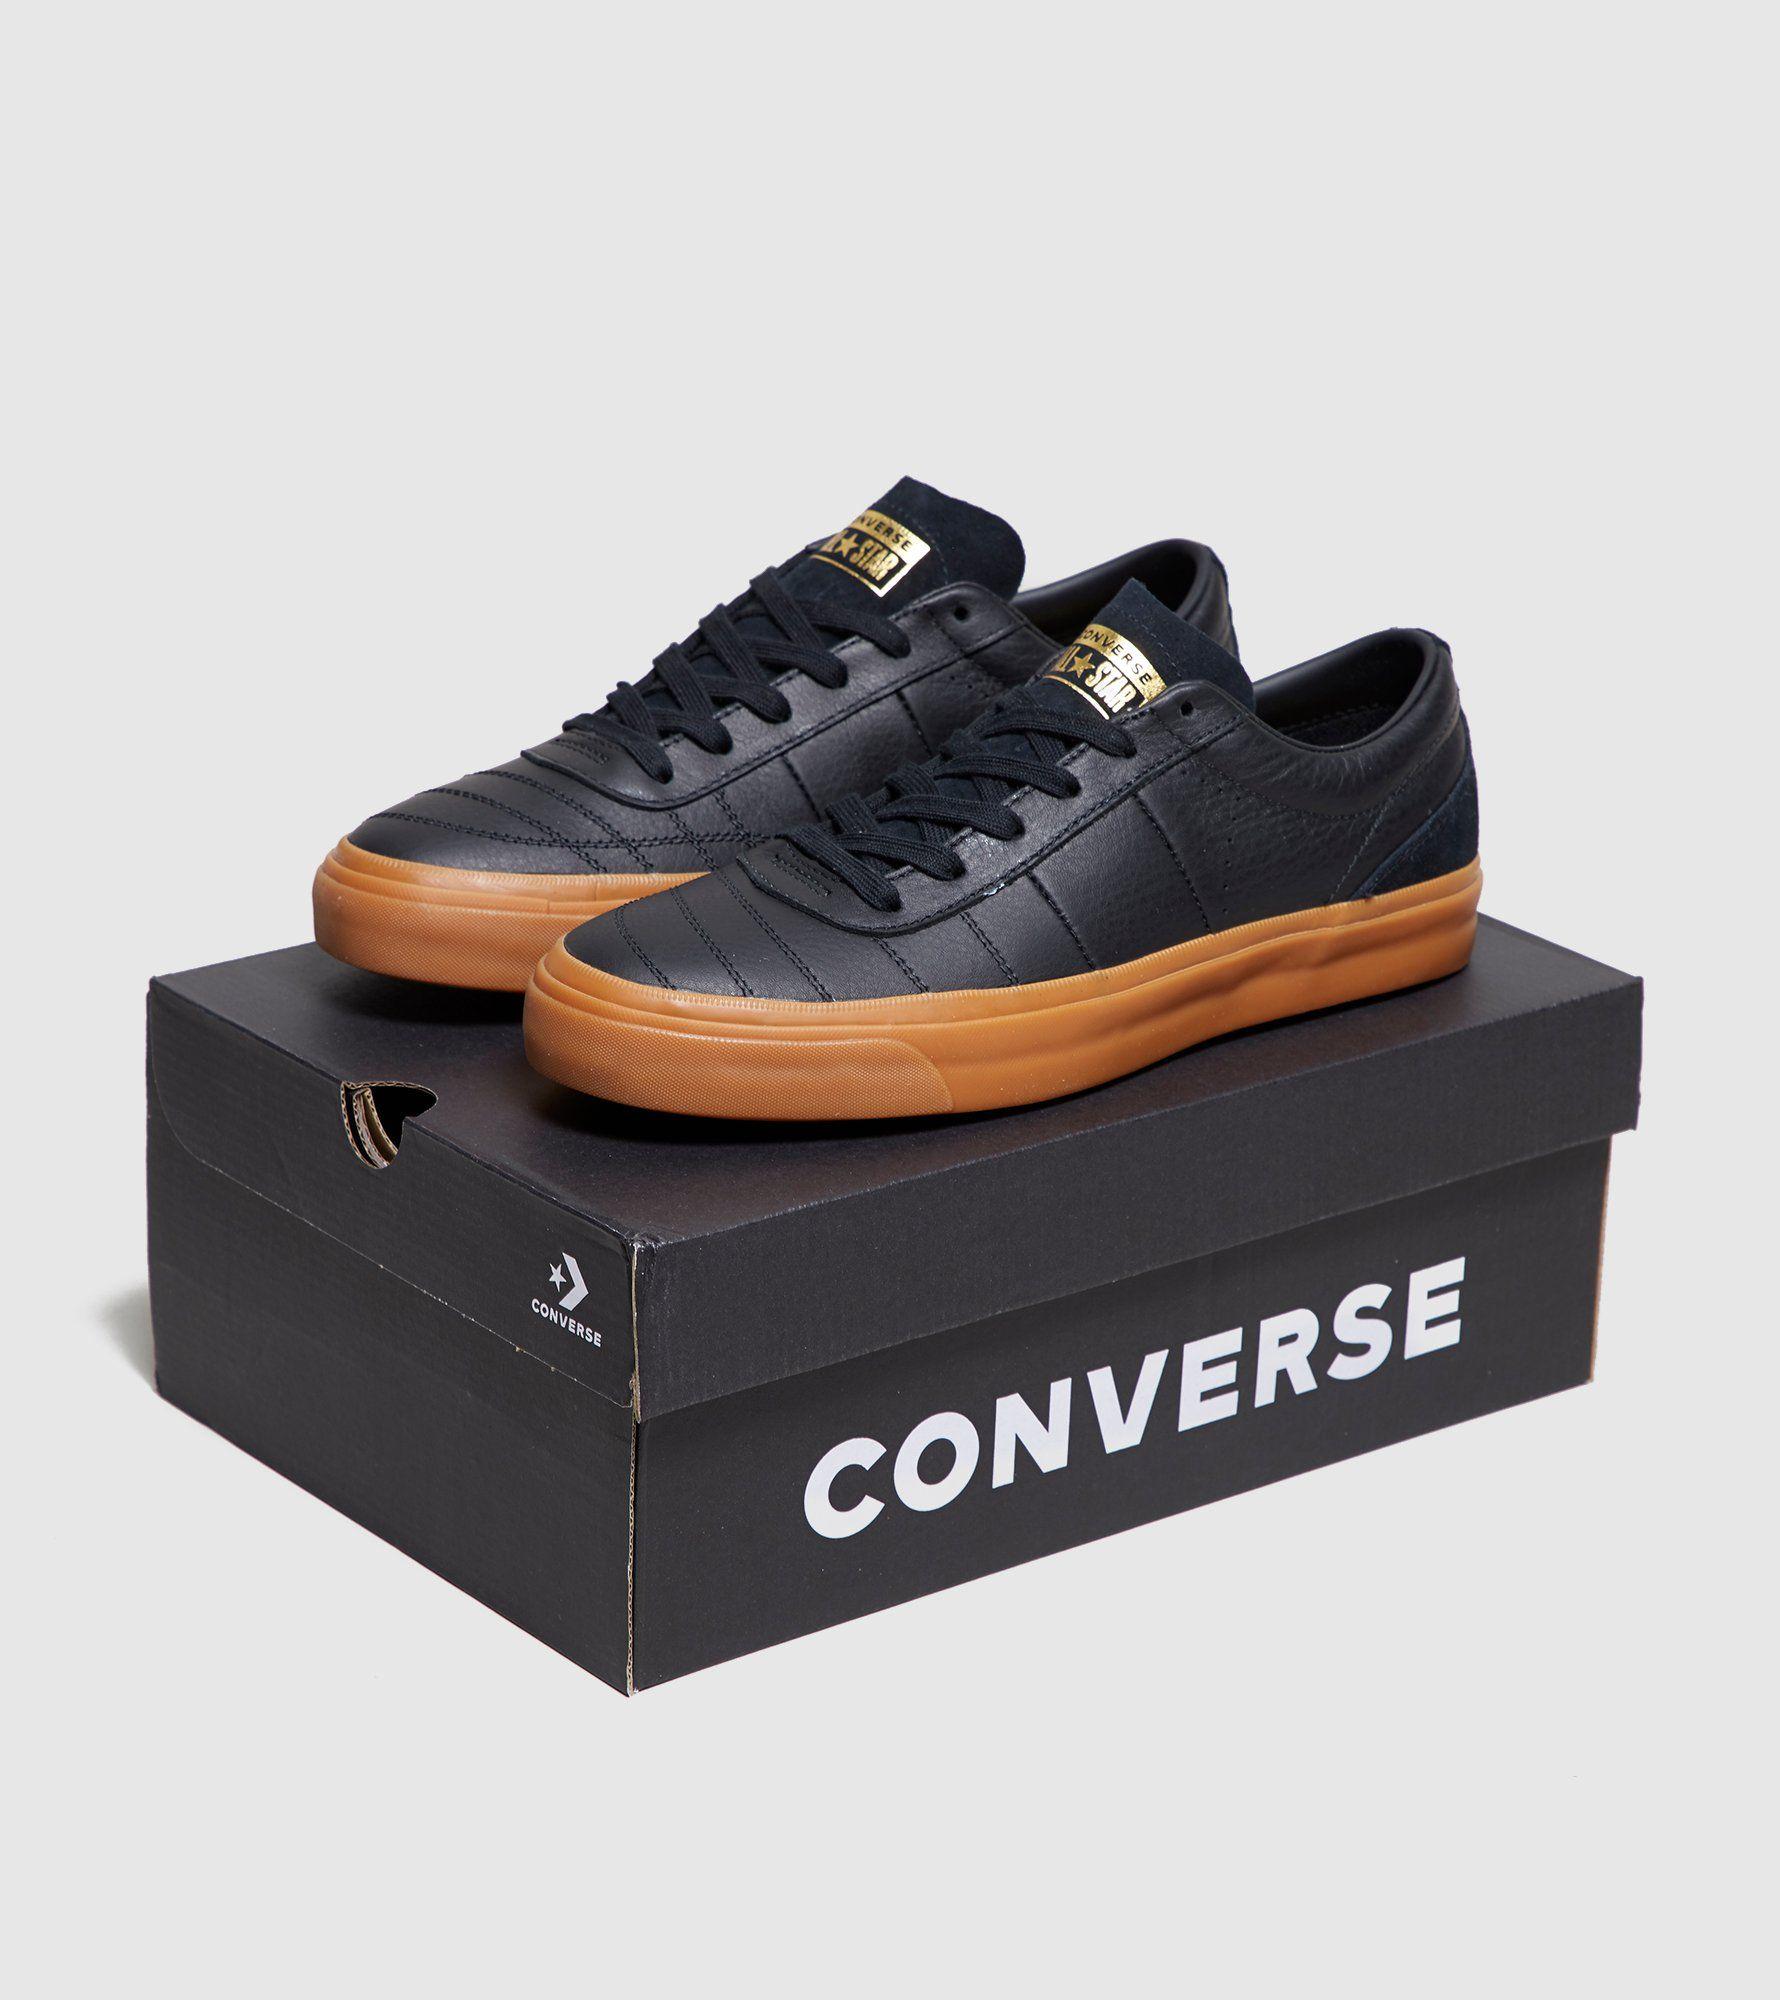 Converse One Star CC